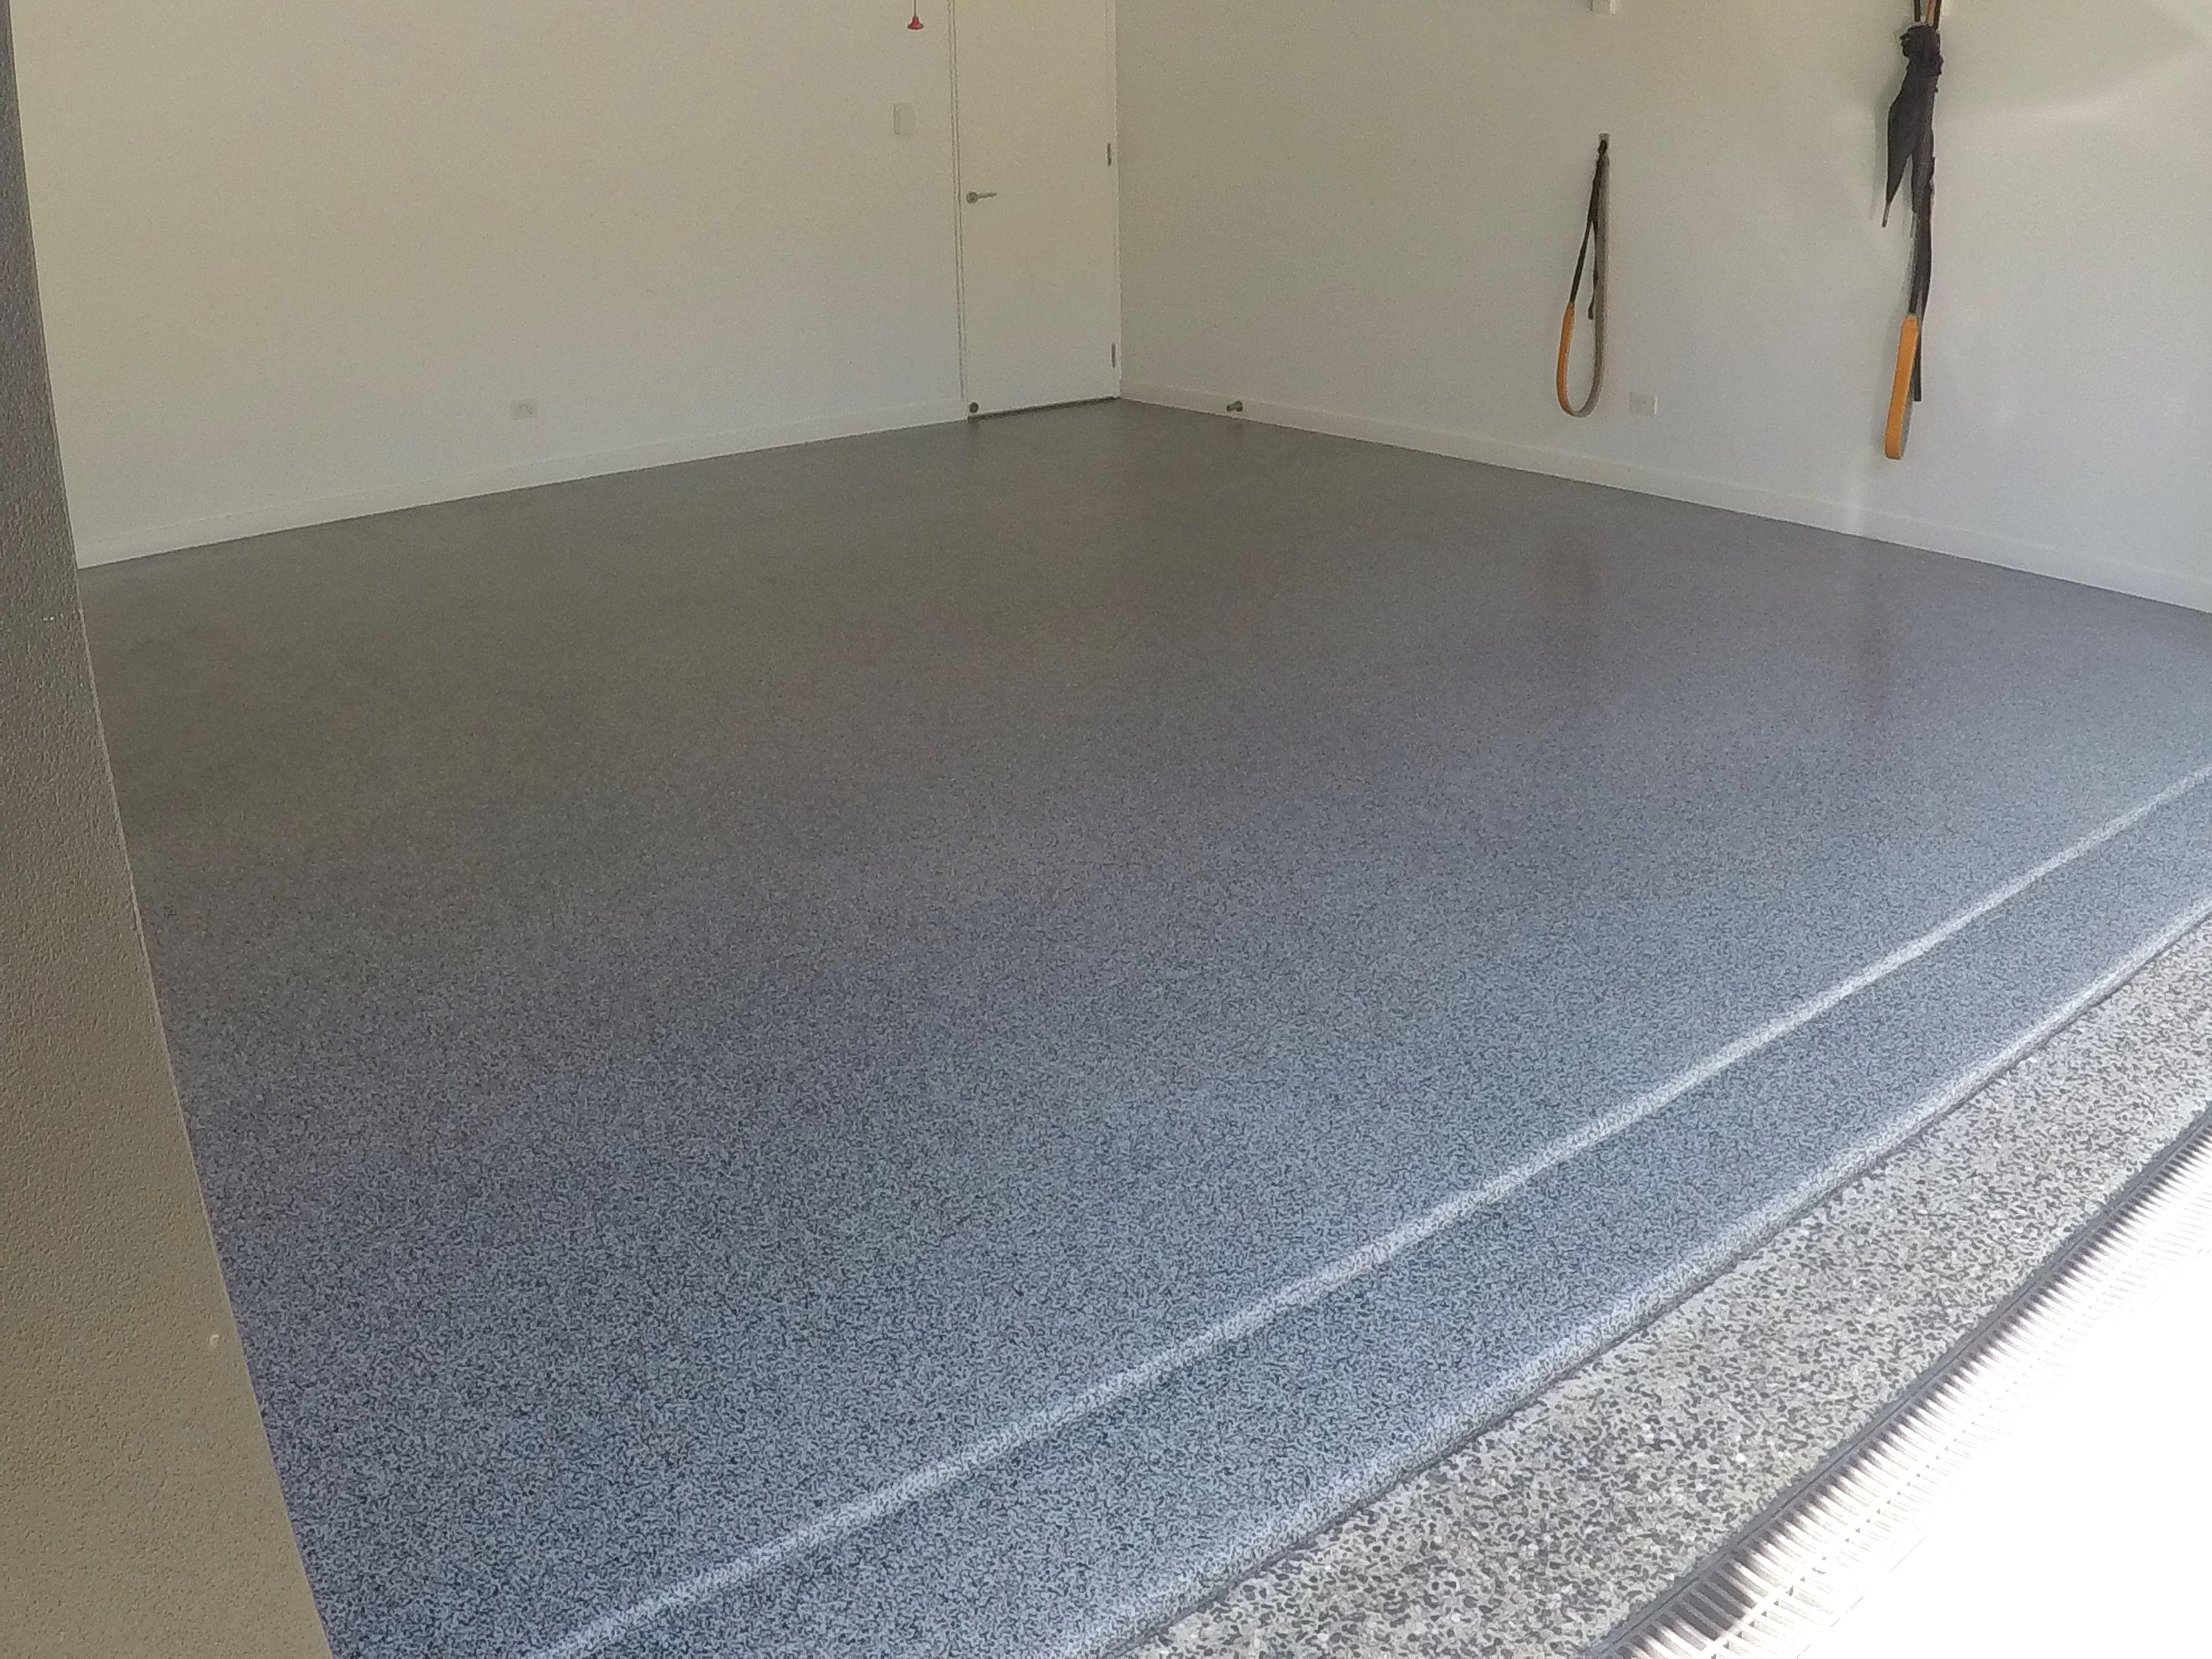 Sunshine Beach Epoxy Flooring The Garage Floor Co A Beautiful Garage Transformation Has Left This Floor With A Epoxy Floor Metallic Epoxy Floor Garage Floor